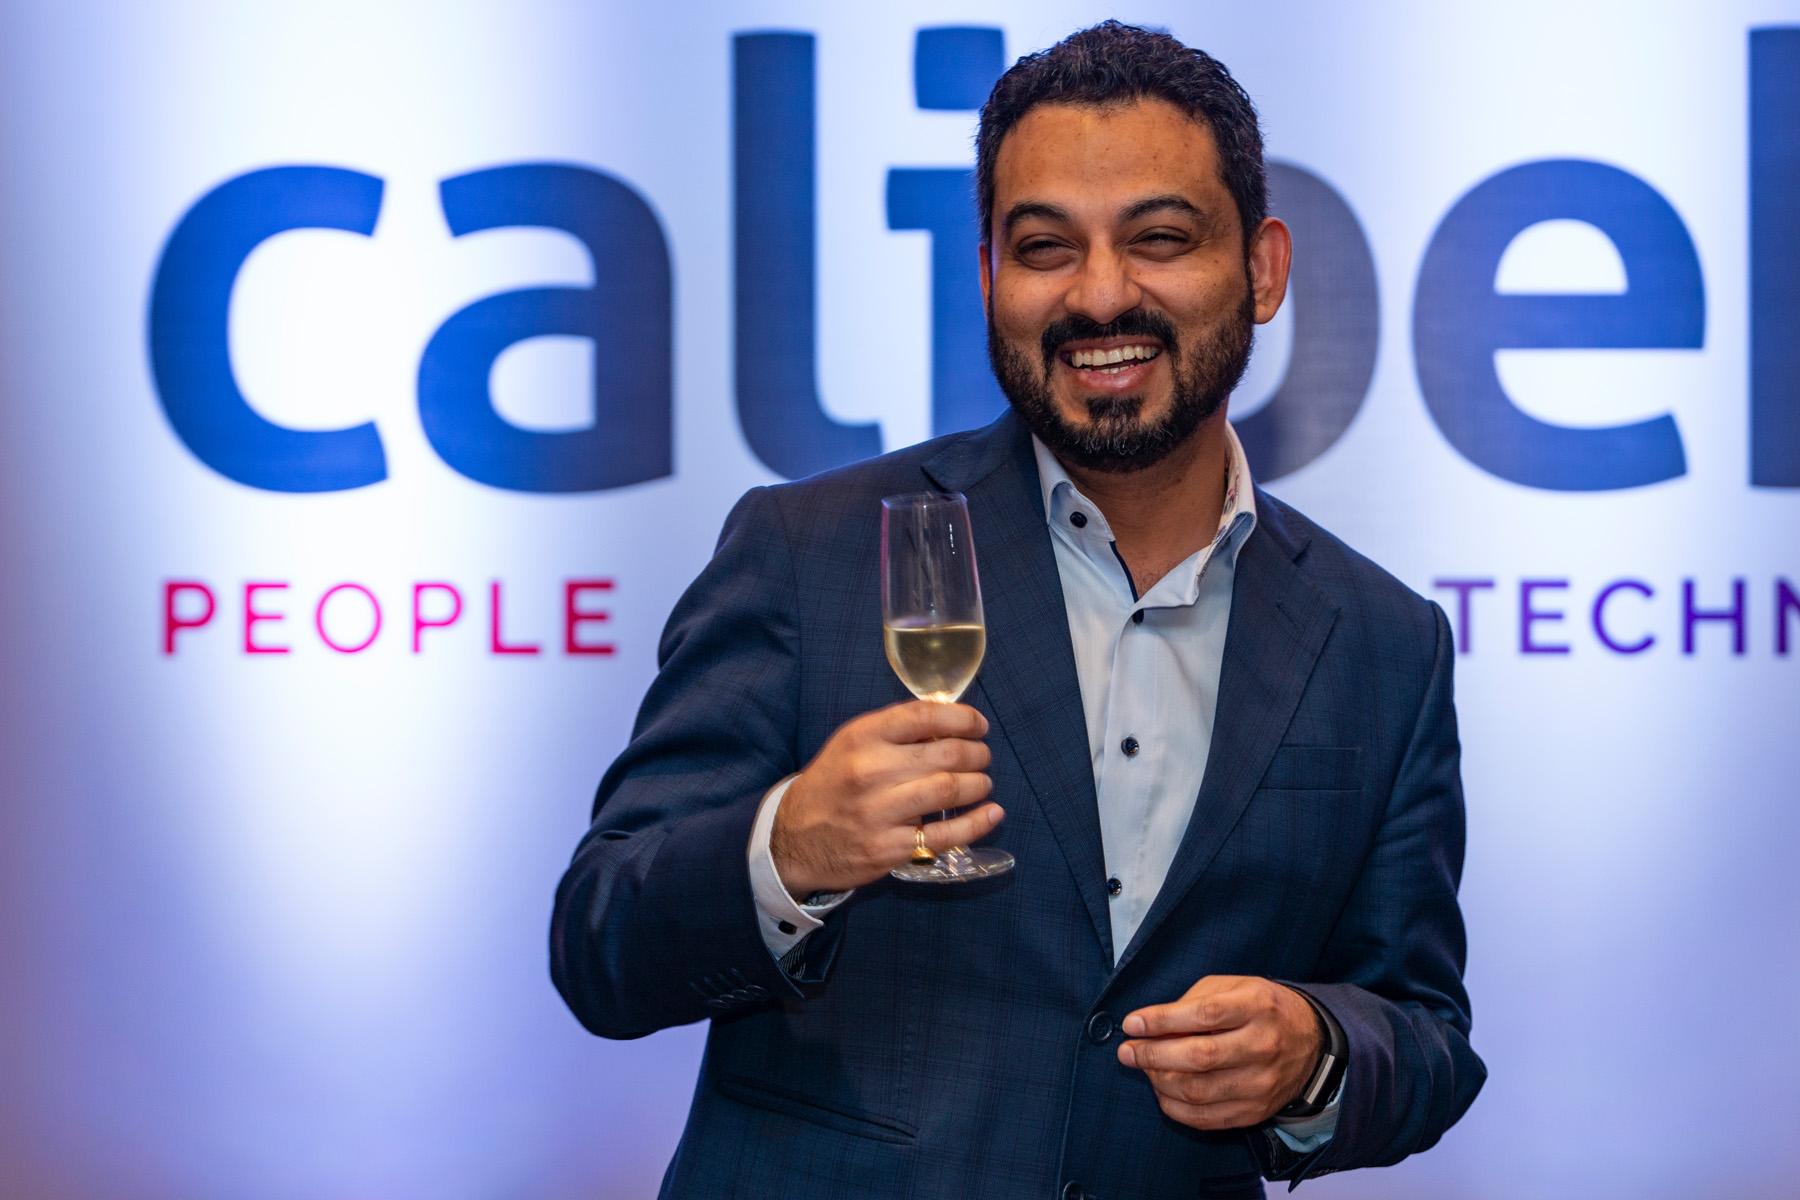 Calibehr Corporate event